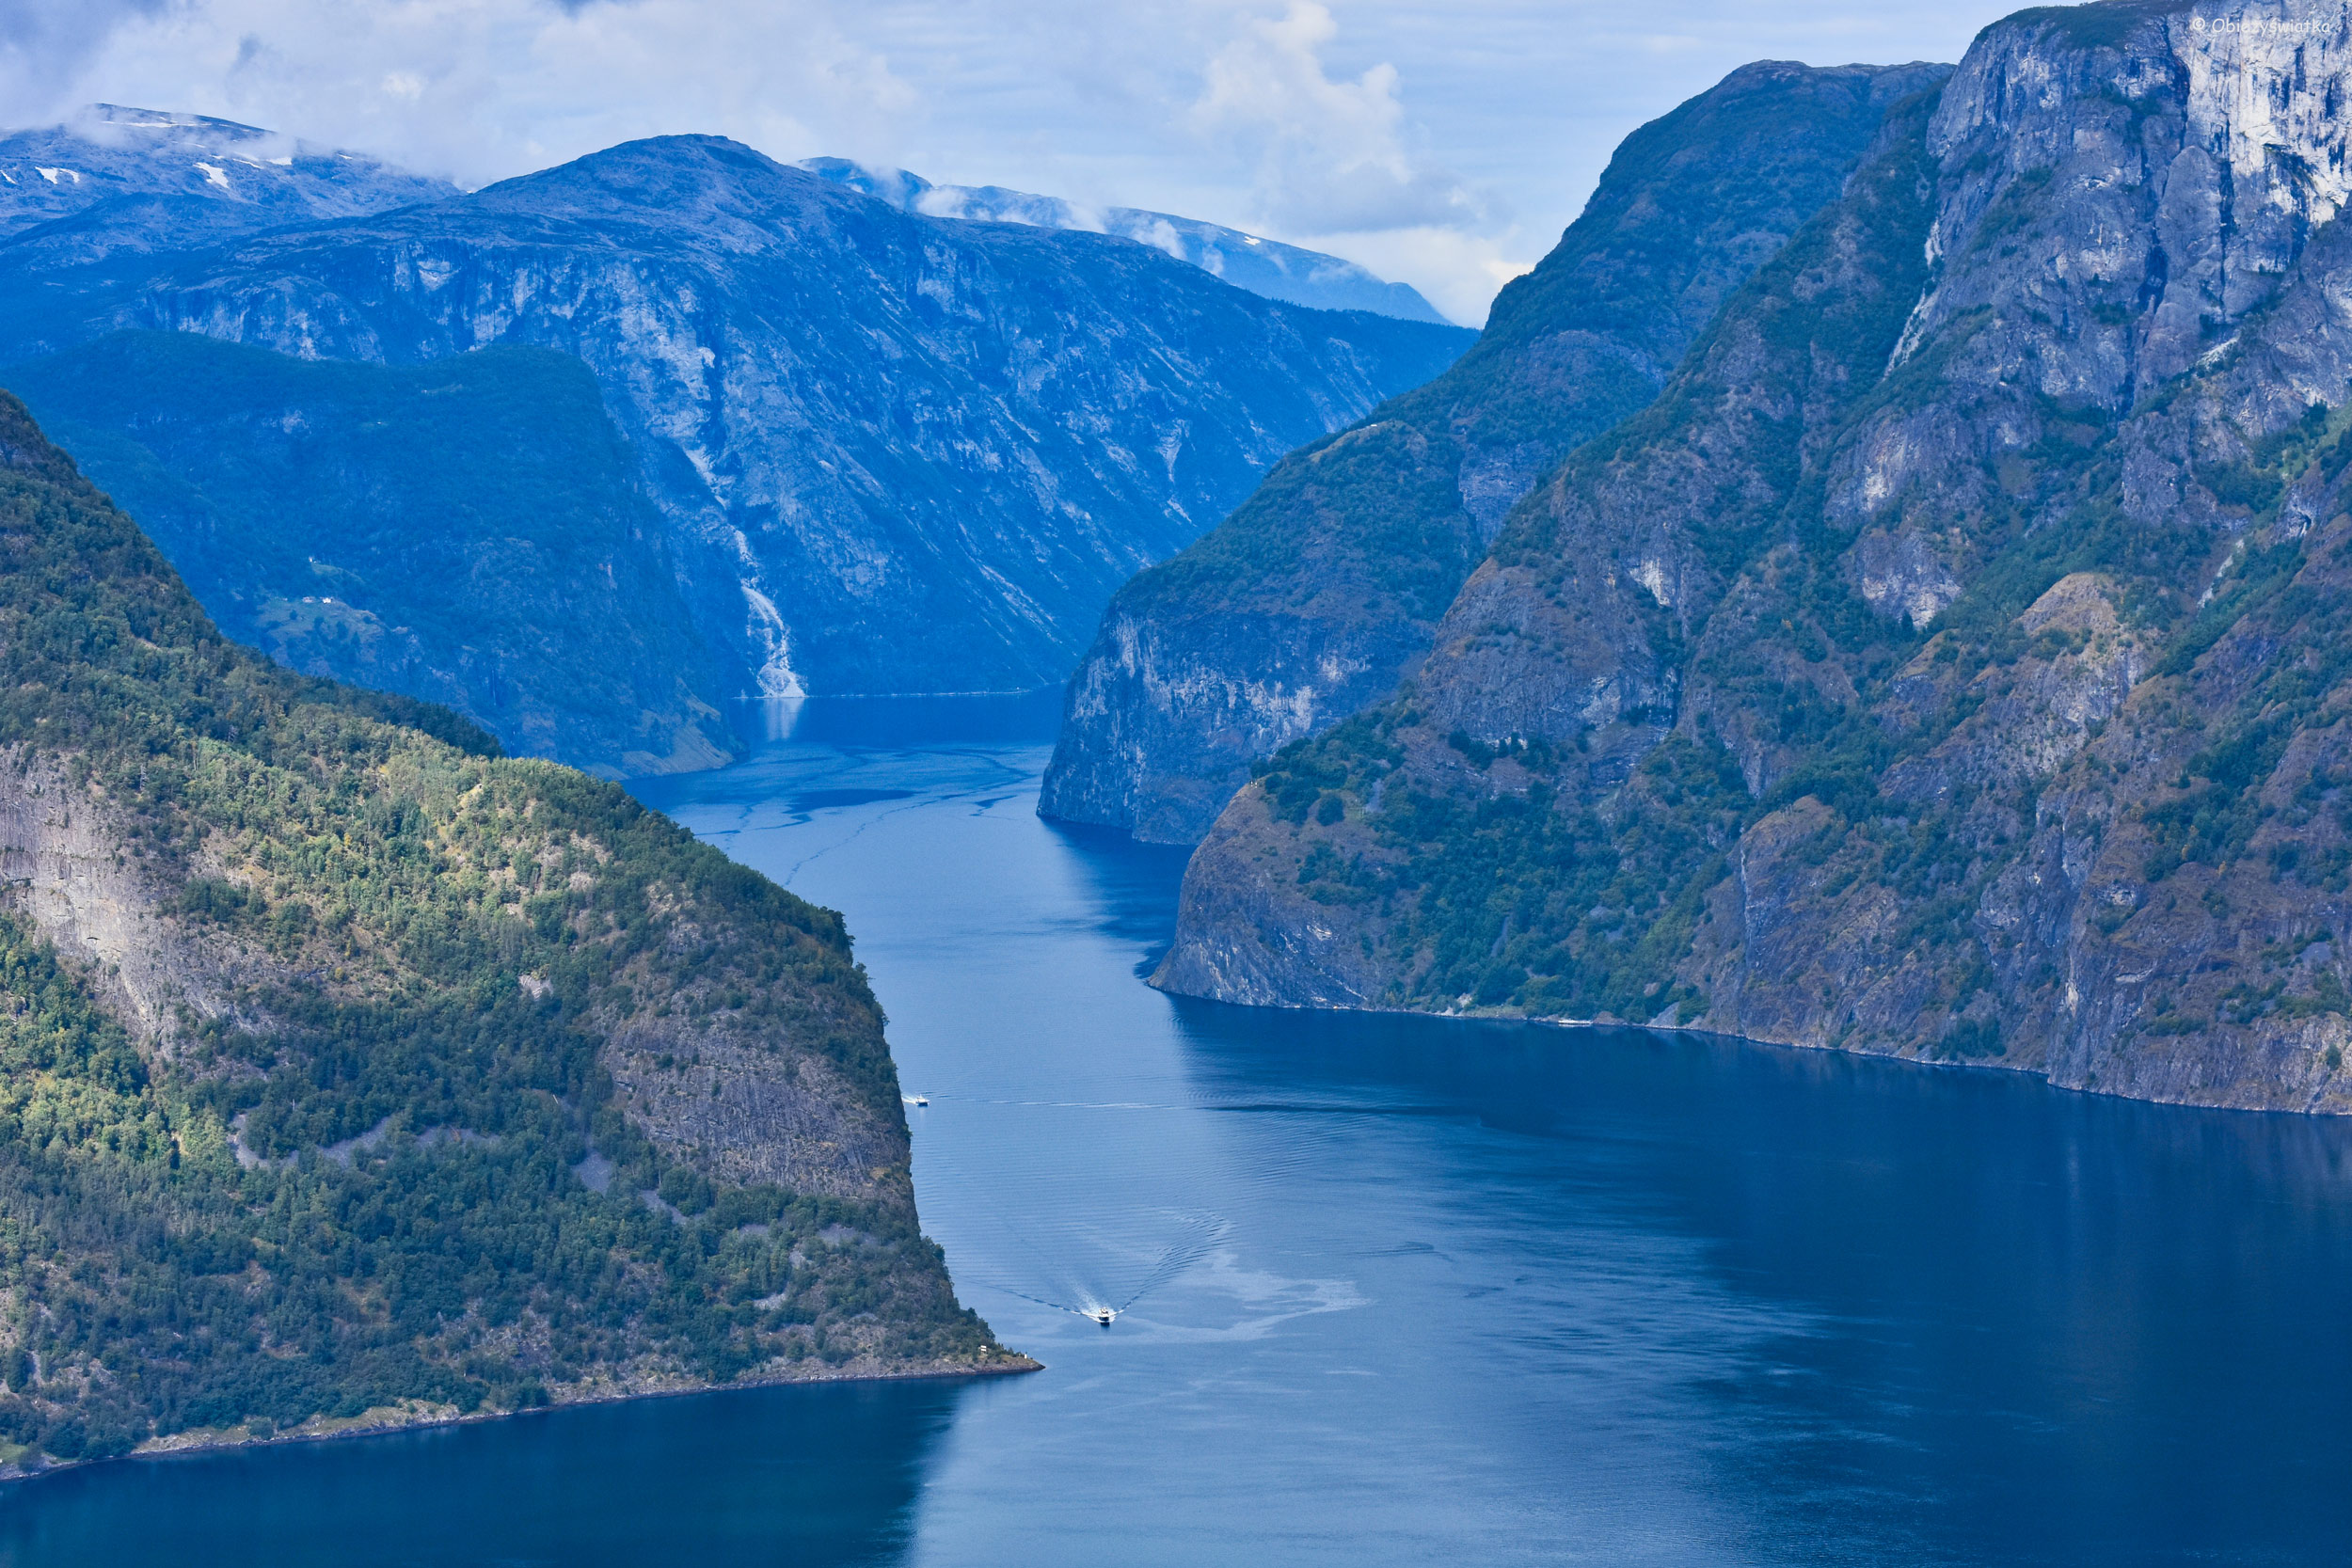 Widok na Aurlandsfjord z platformy Stegastein, Norwegia